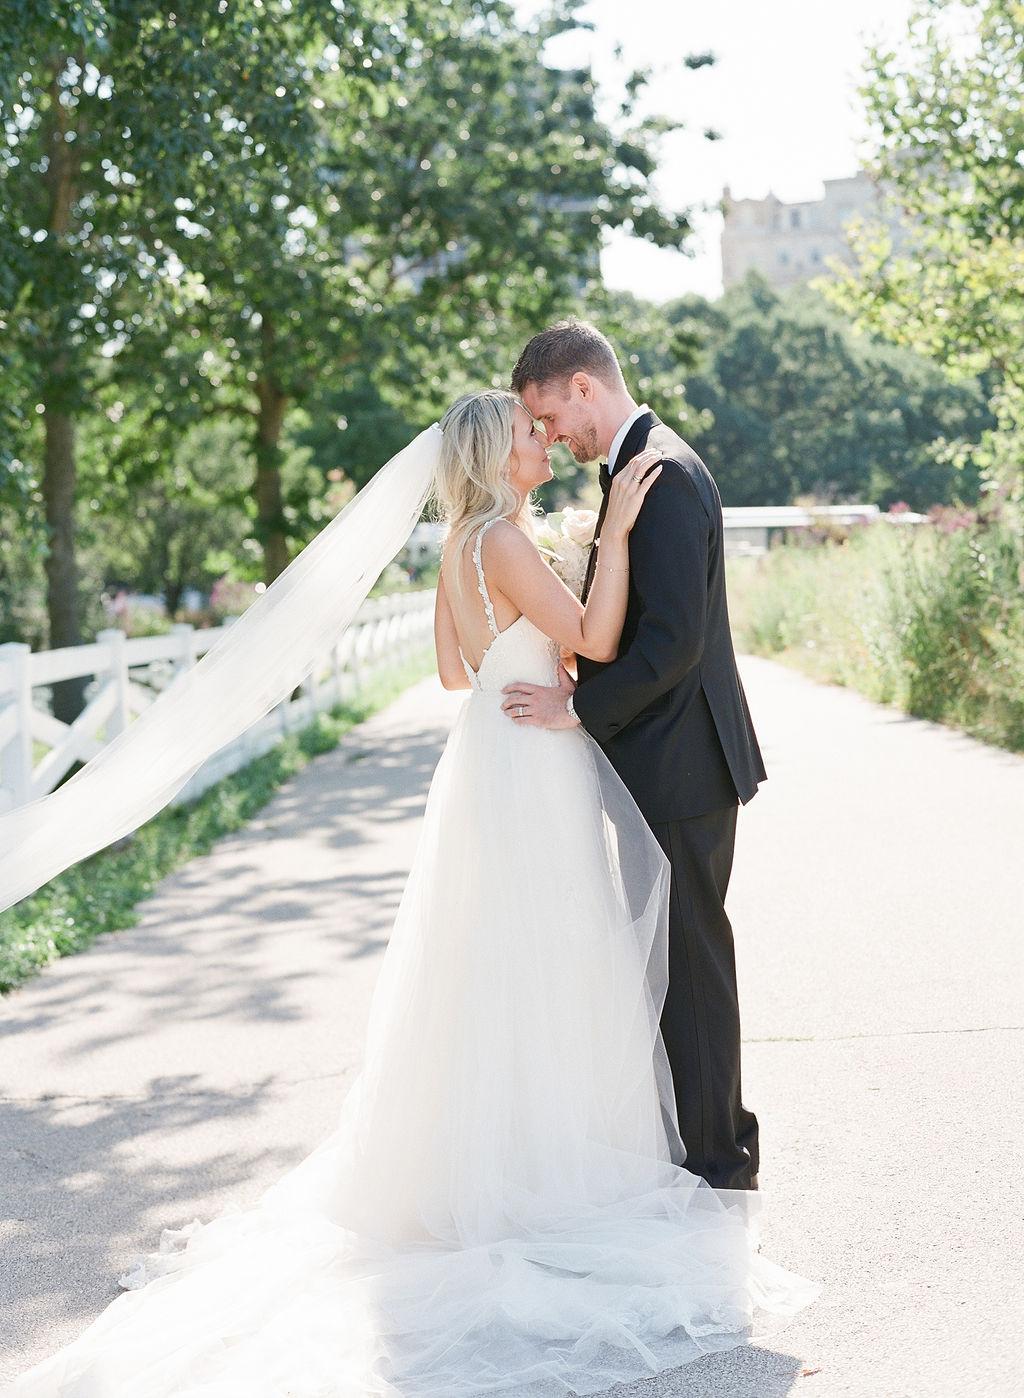 Chicago micro wedding Bonphotage 15